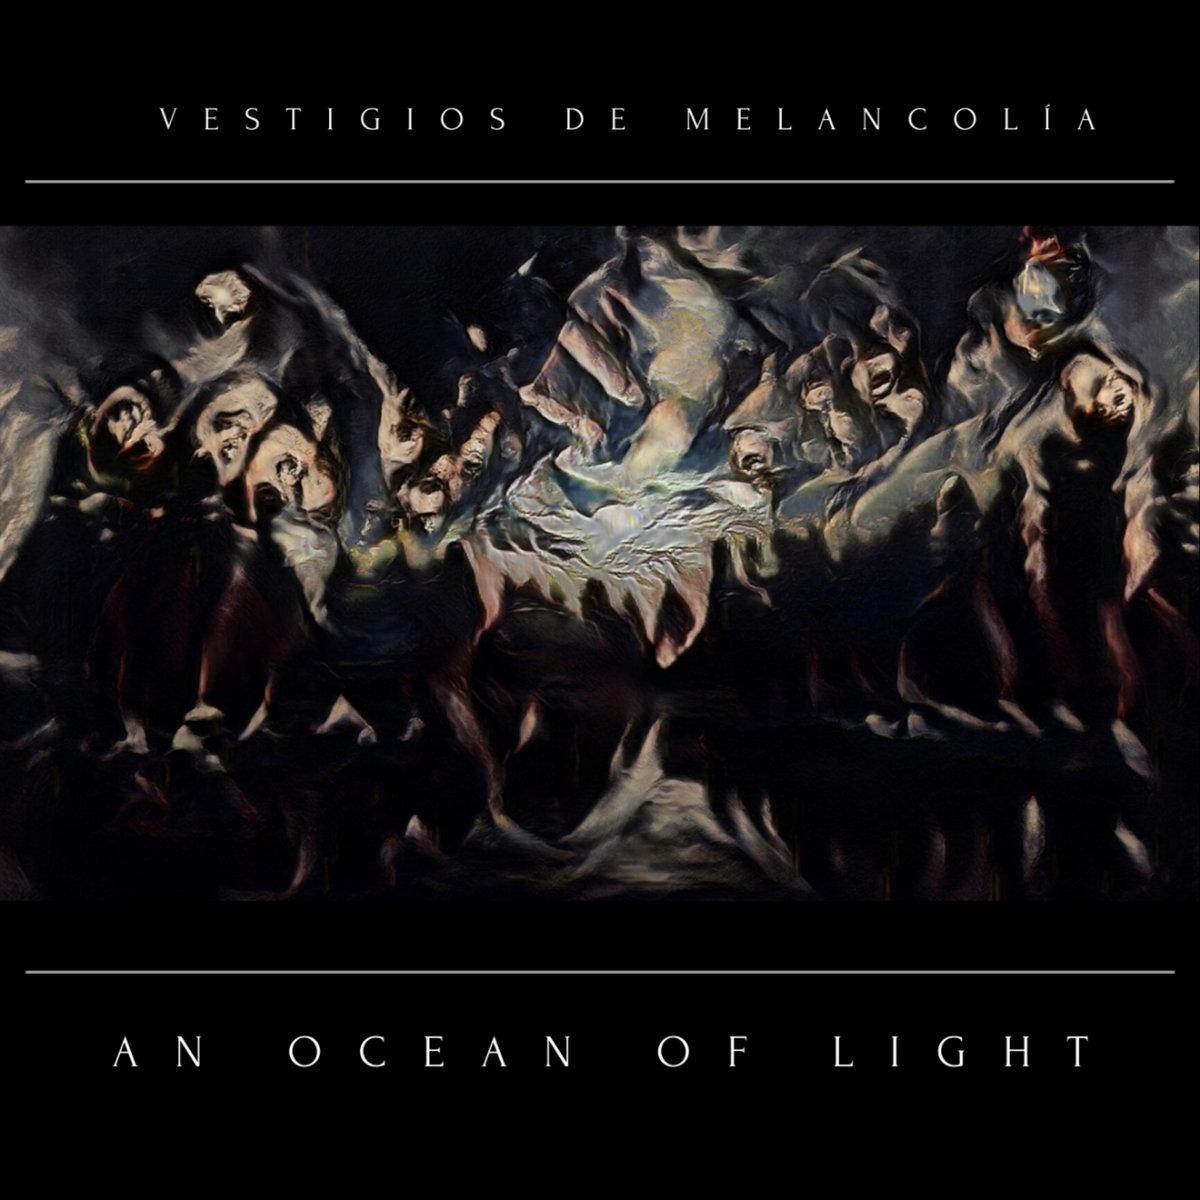 Vestigios De Melancolía An Ocean Of Light Album Cover Artwork